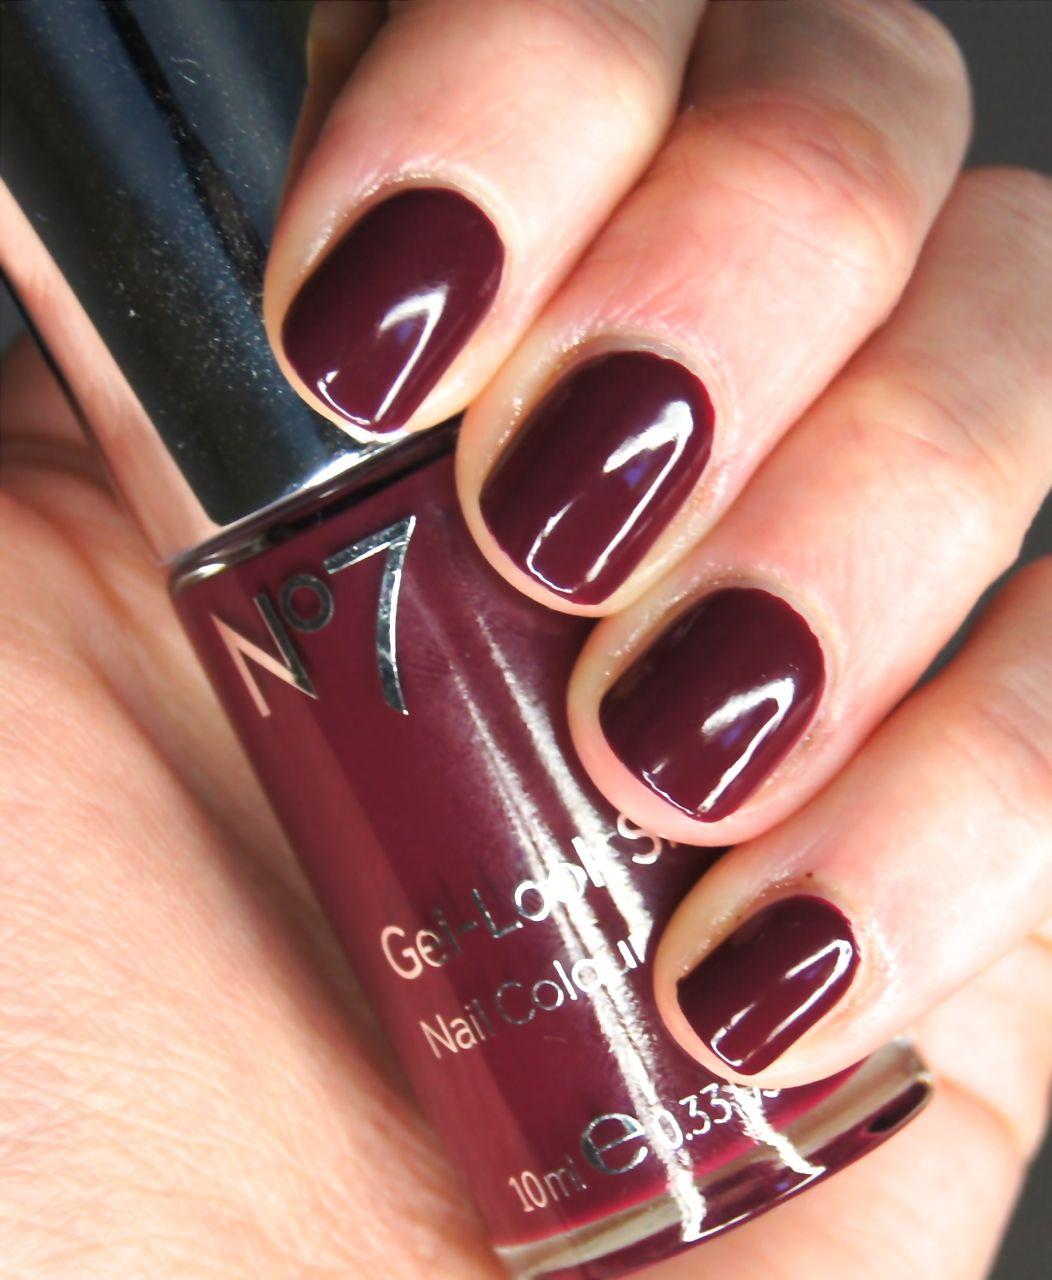 No7 Gel-Look Shine Nail Colour deep wine | Nails | Pinterest